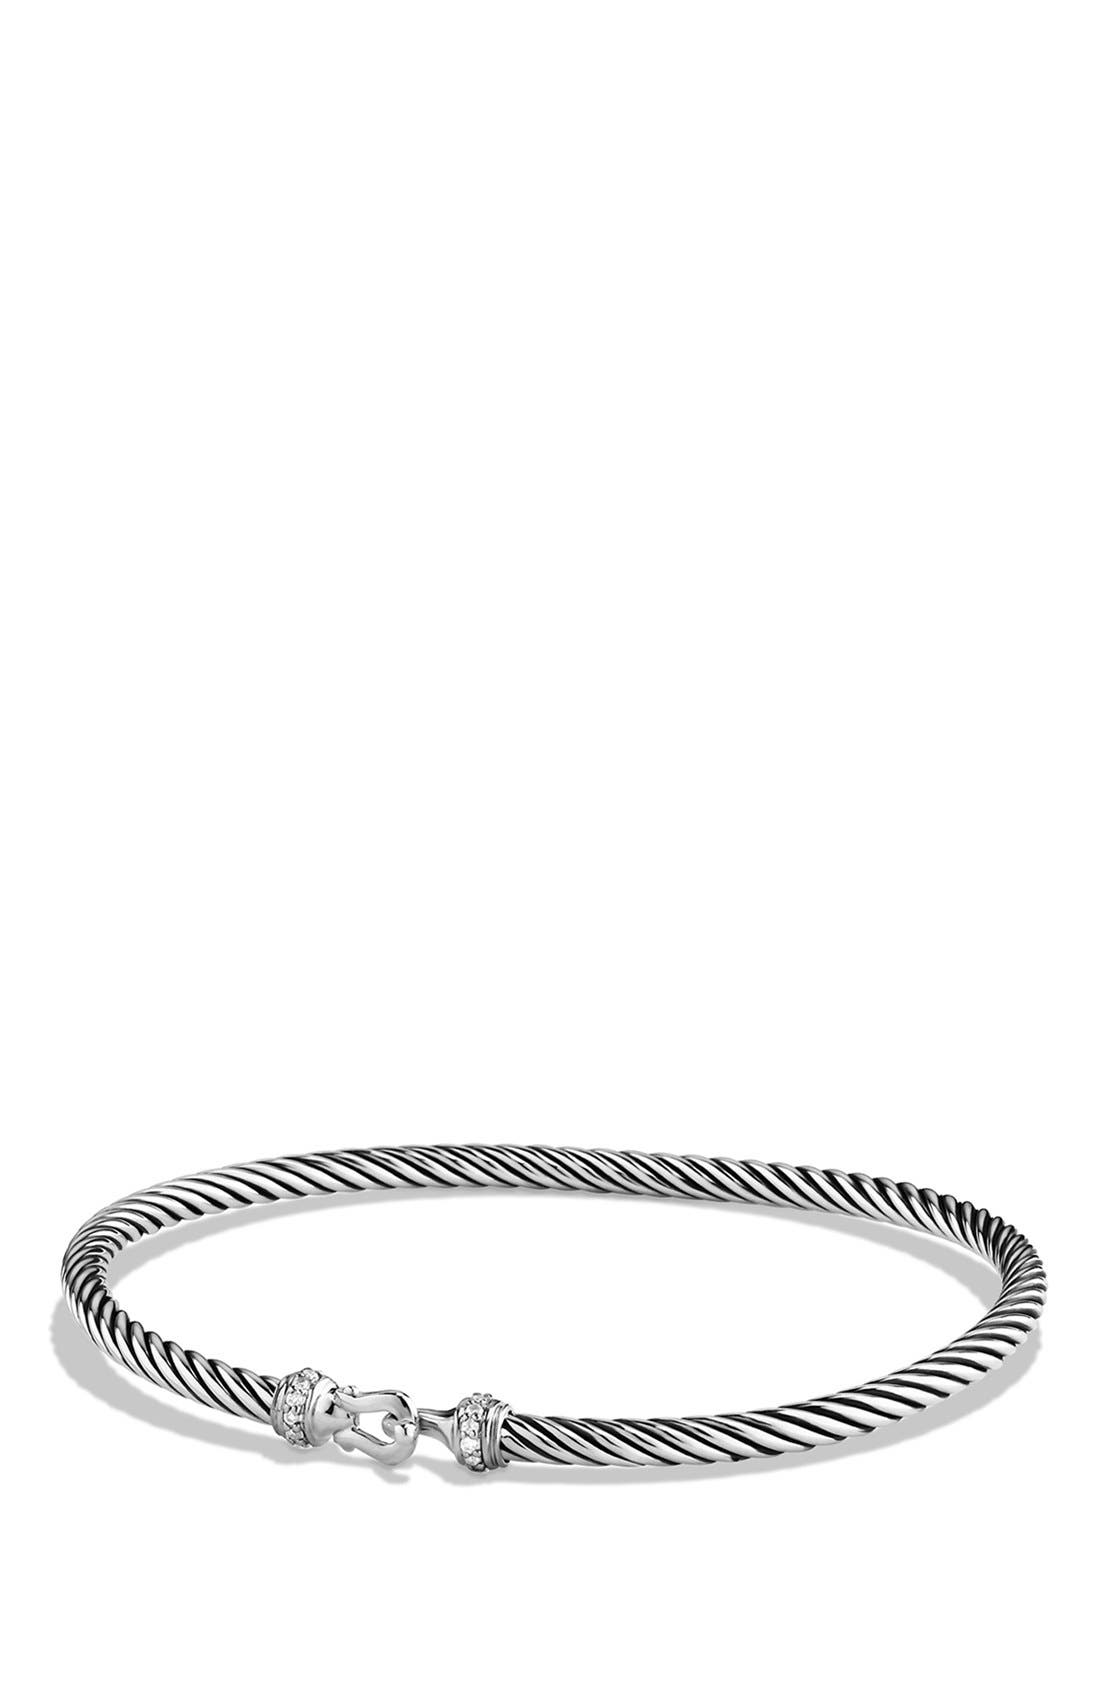 DAVID YURMAN Cable Collectibles Buckle Bangle Bracelet with Diamonds, 3mm, Main, color, DIAMOND